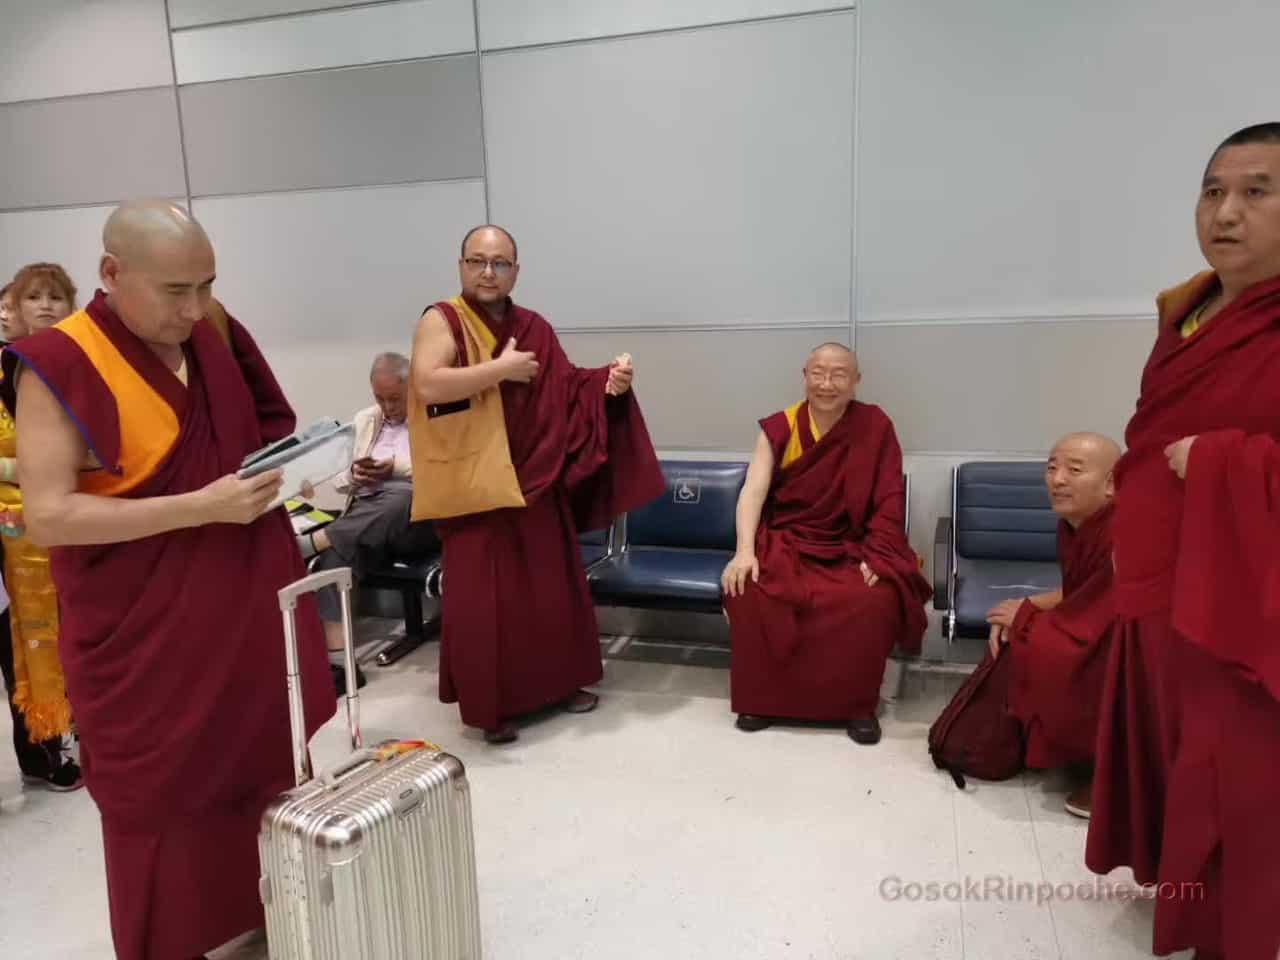 Gosok Rinpoche Leaving Toronto 20190926184300